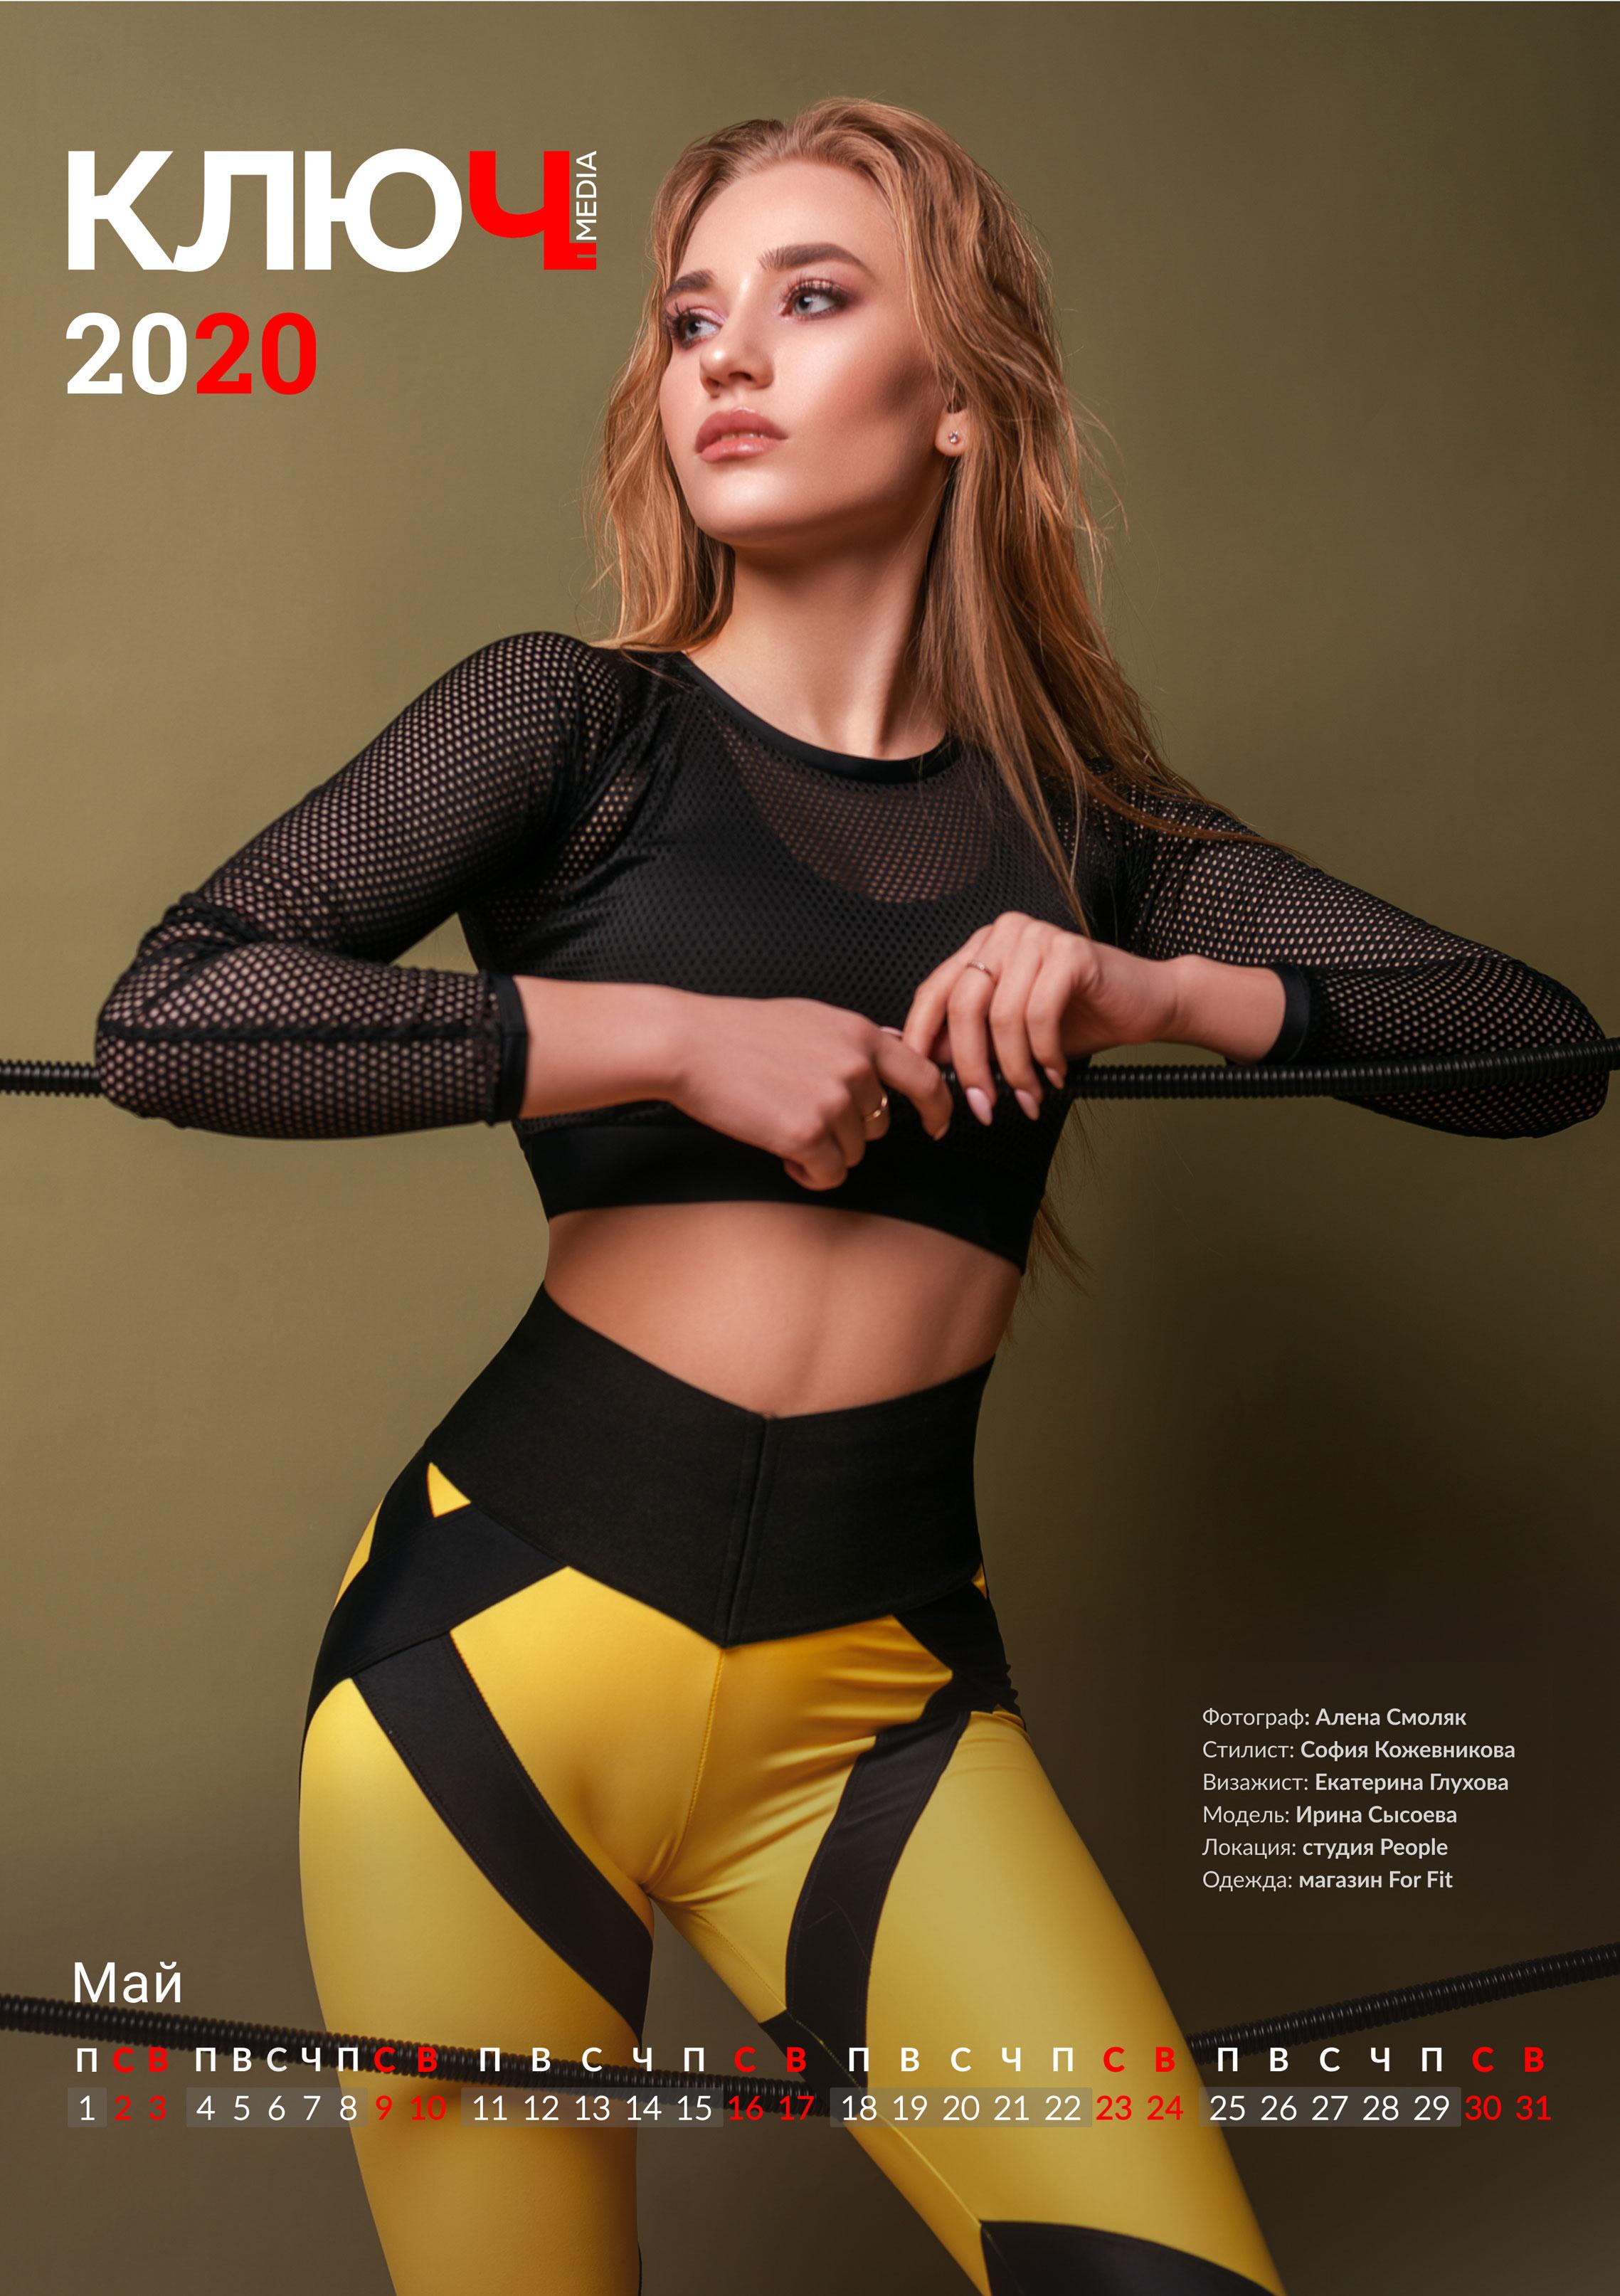 Календарь интернет-проекта Ключ-Медиа на 2020 год / май - Ирина Сысоева